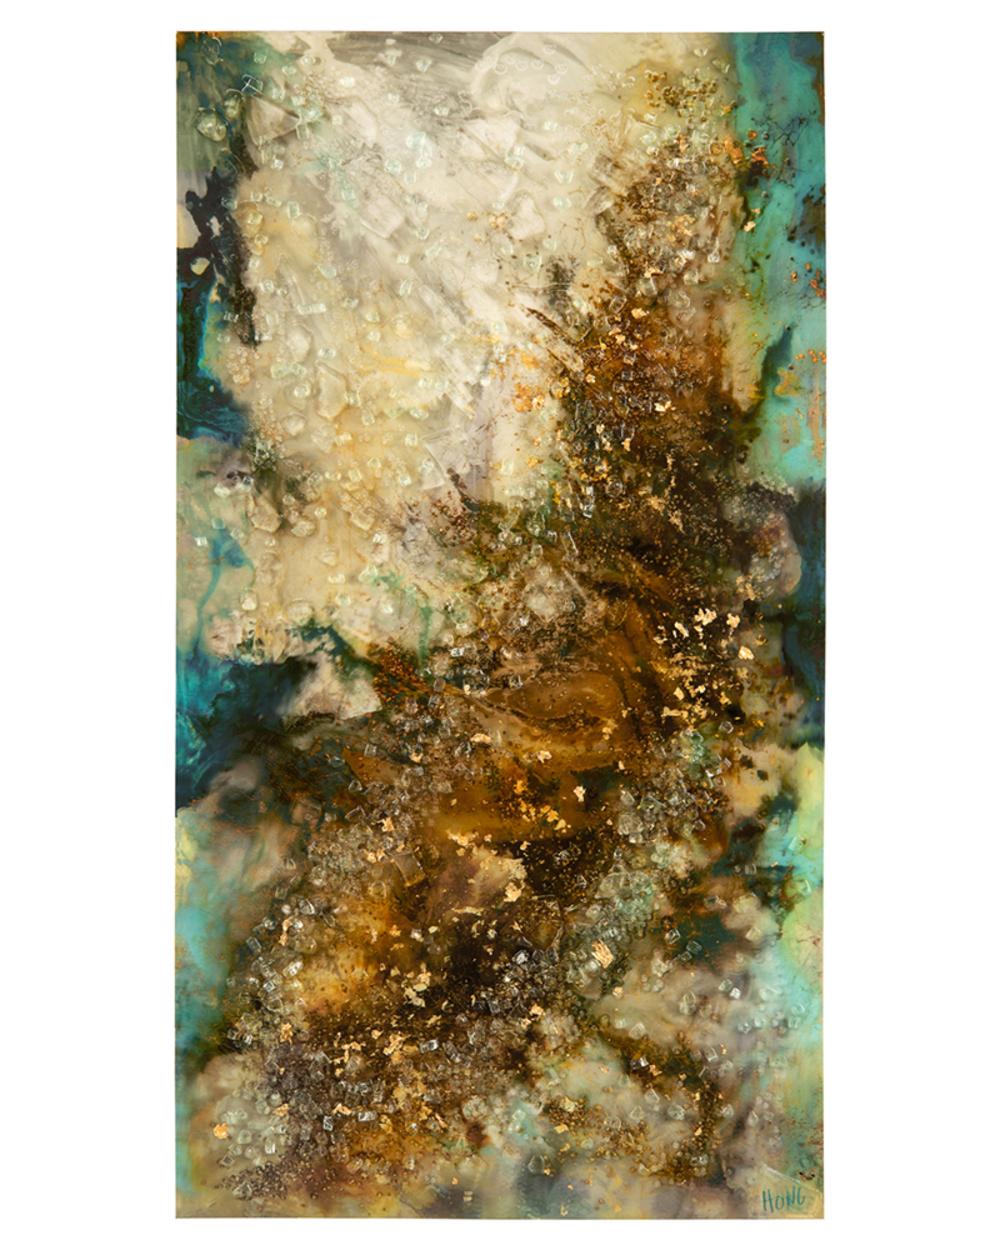 John Richard Collection - Mary Hong's Intergalactic I Art